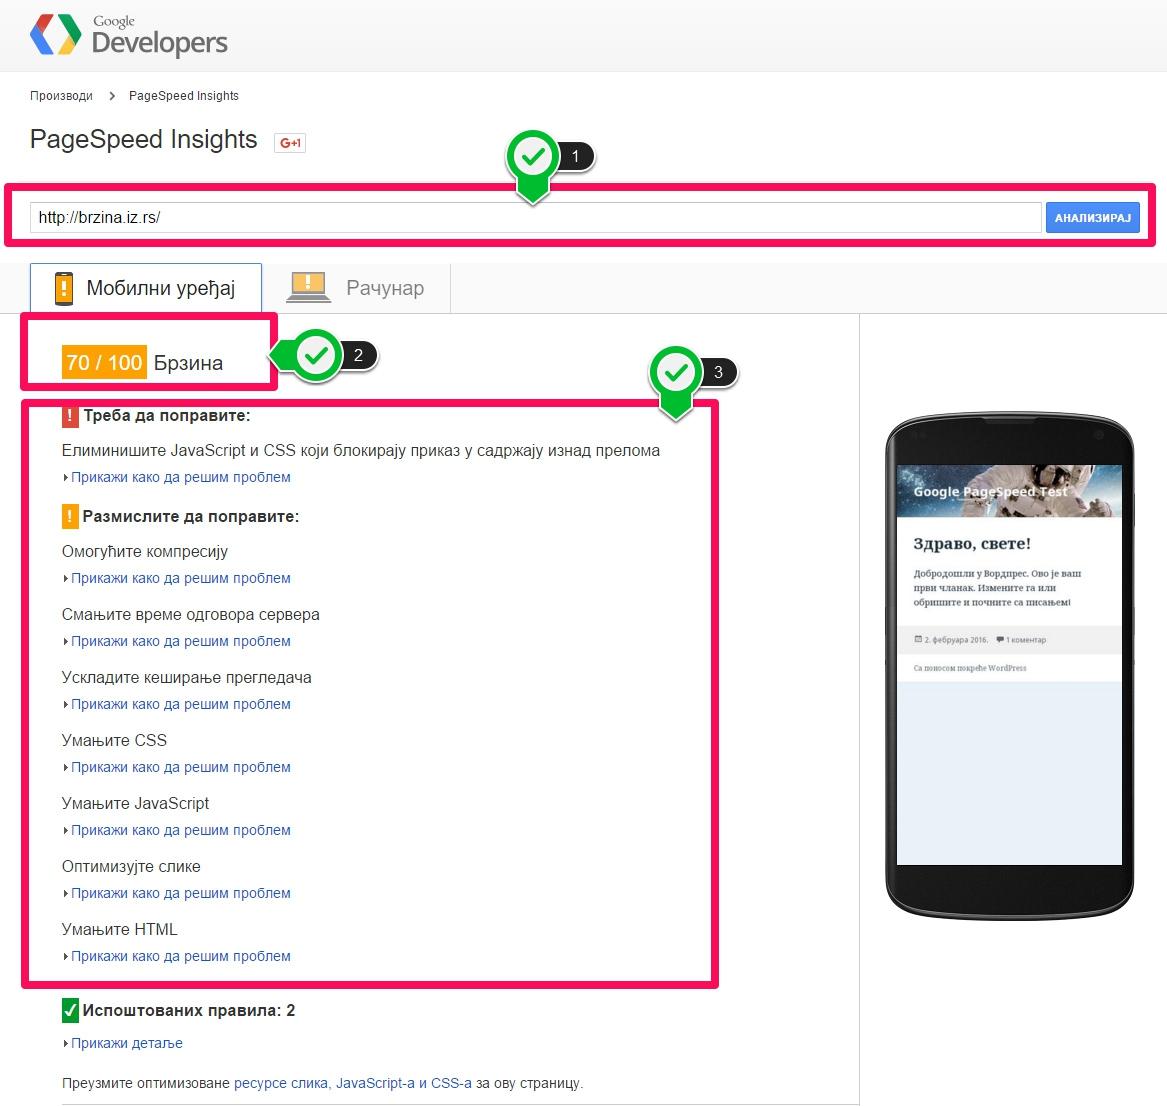 Google-PageSpeed-Insights-slika-3